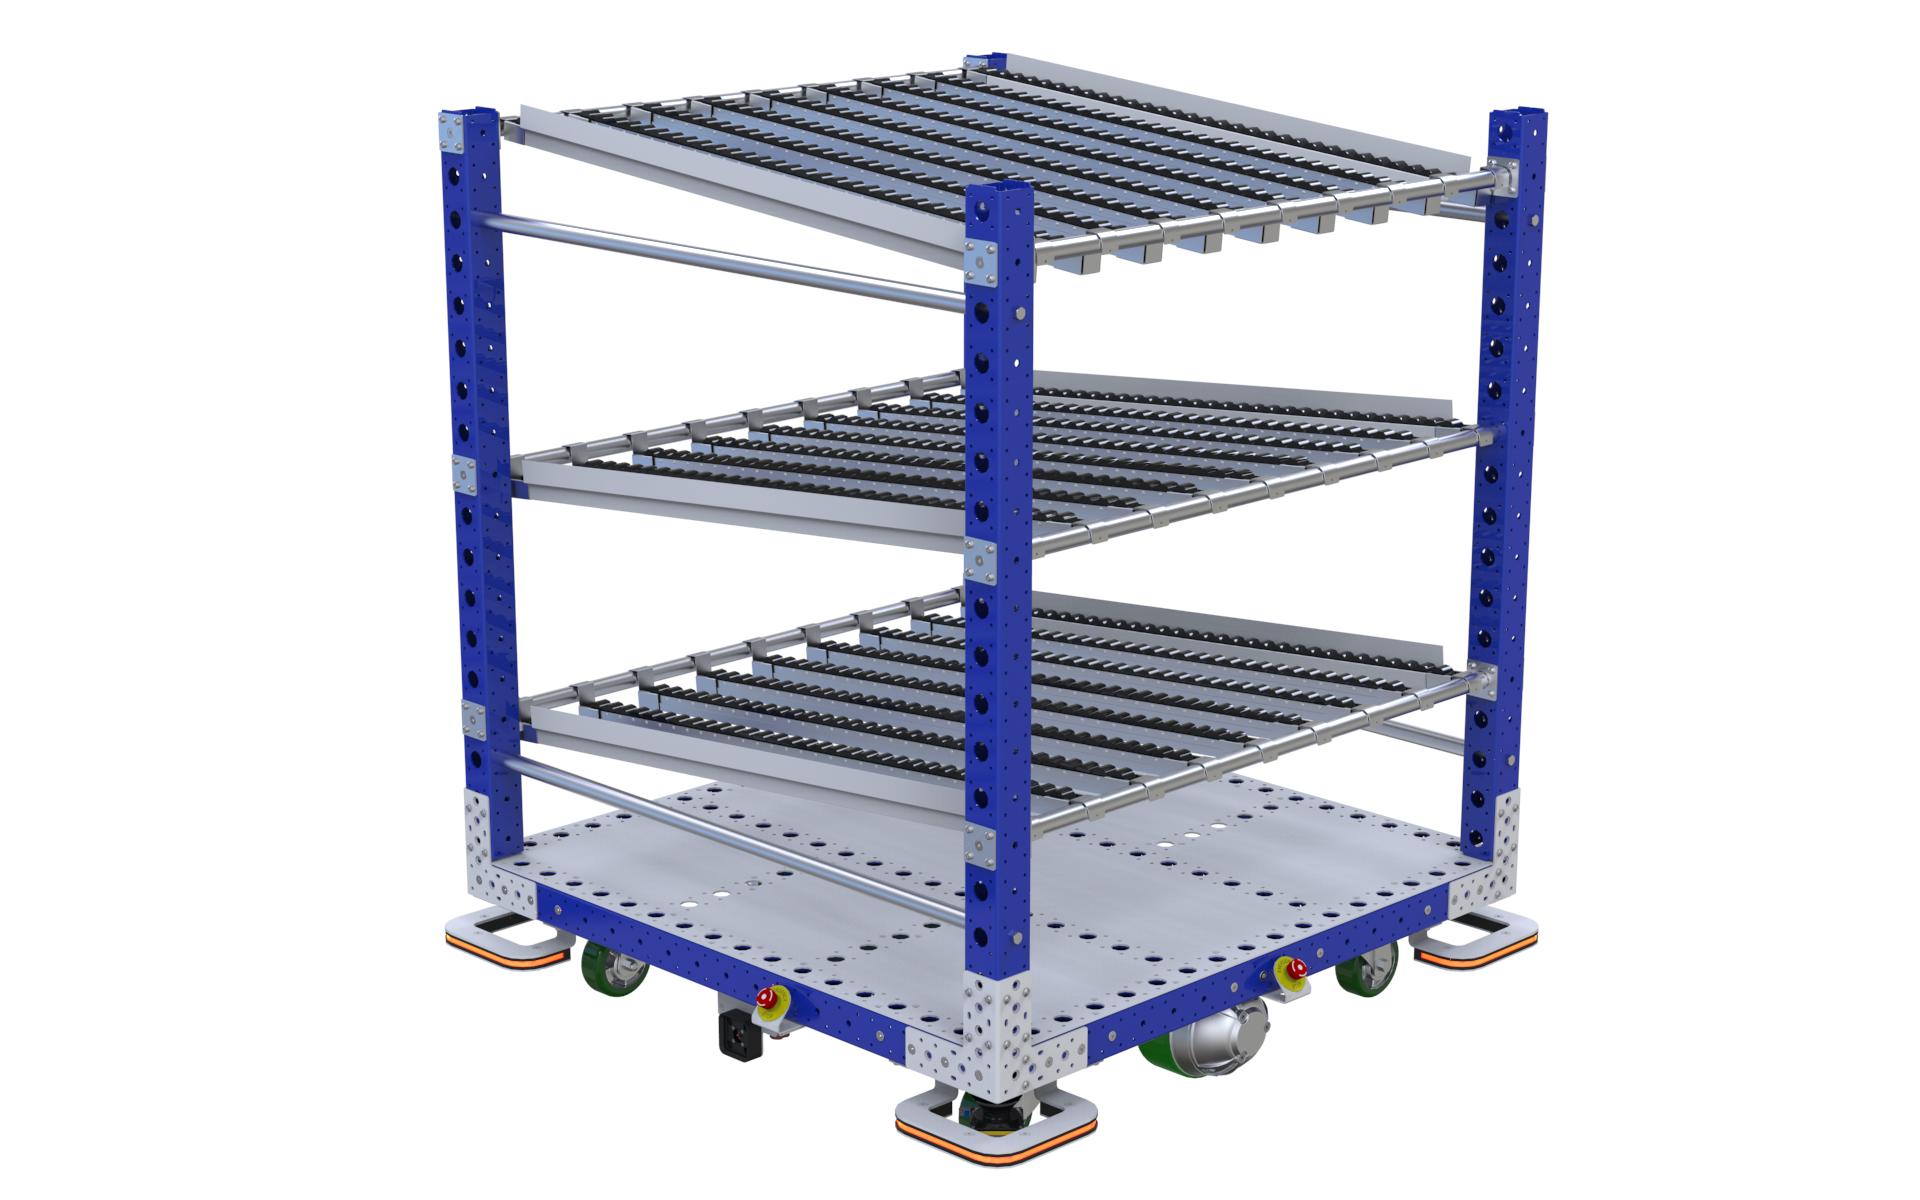 eQart - Flow Rack US 48 x 48 Inch